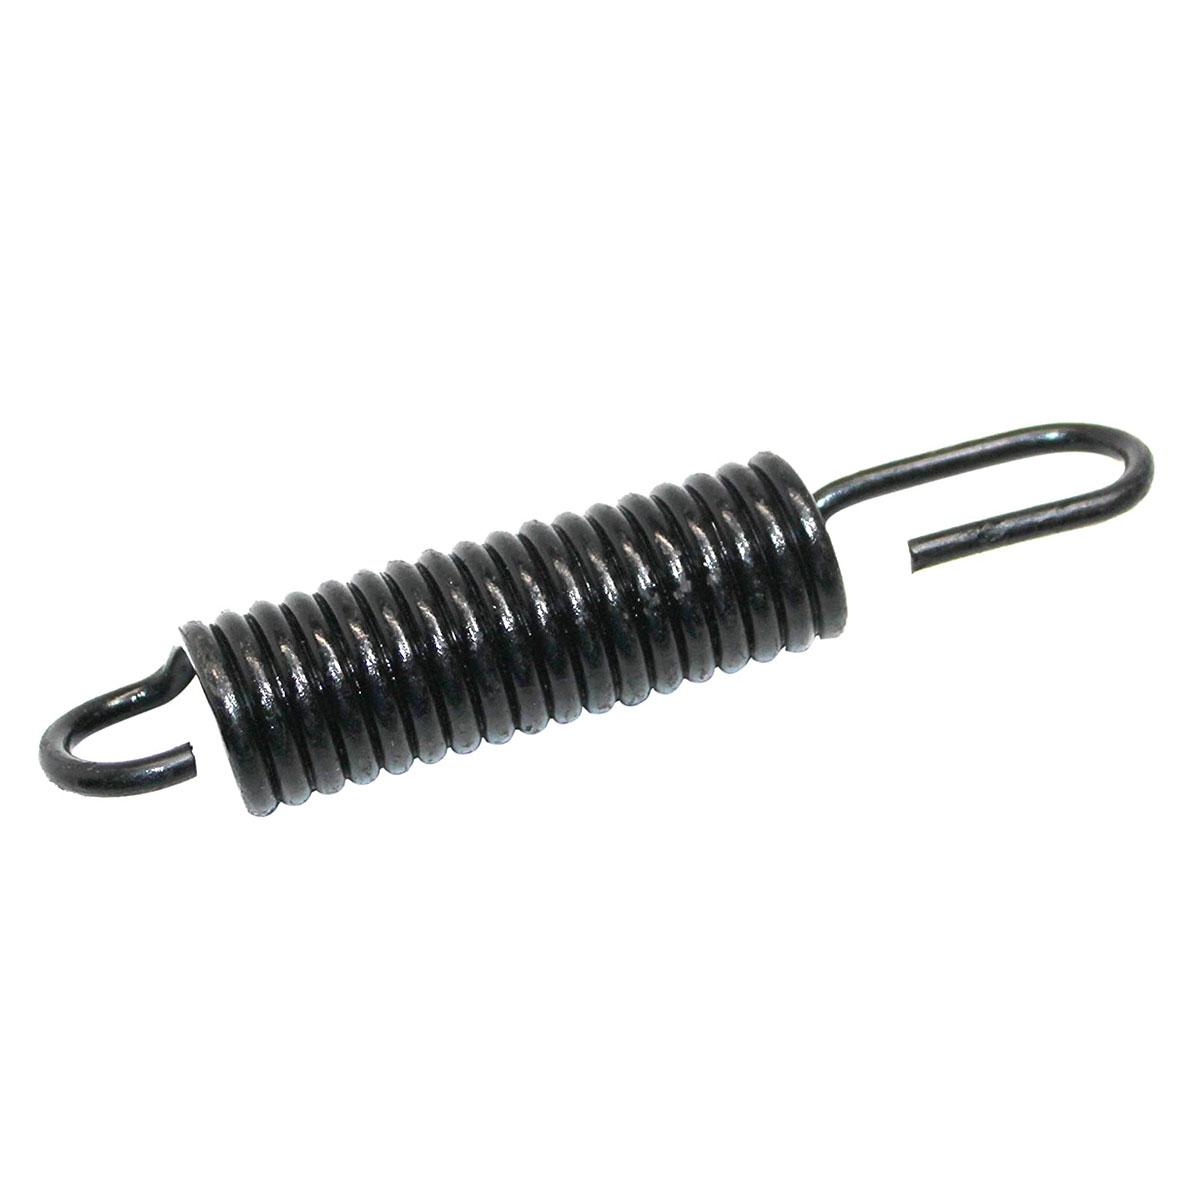 yth23v48 husqvarna riding mower drive parts